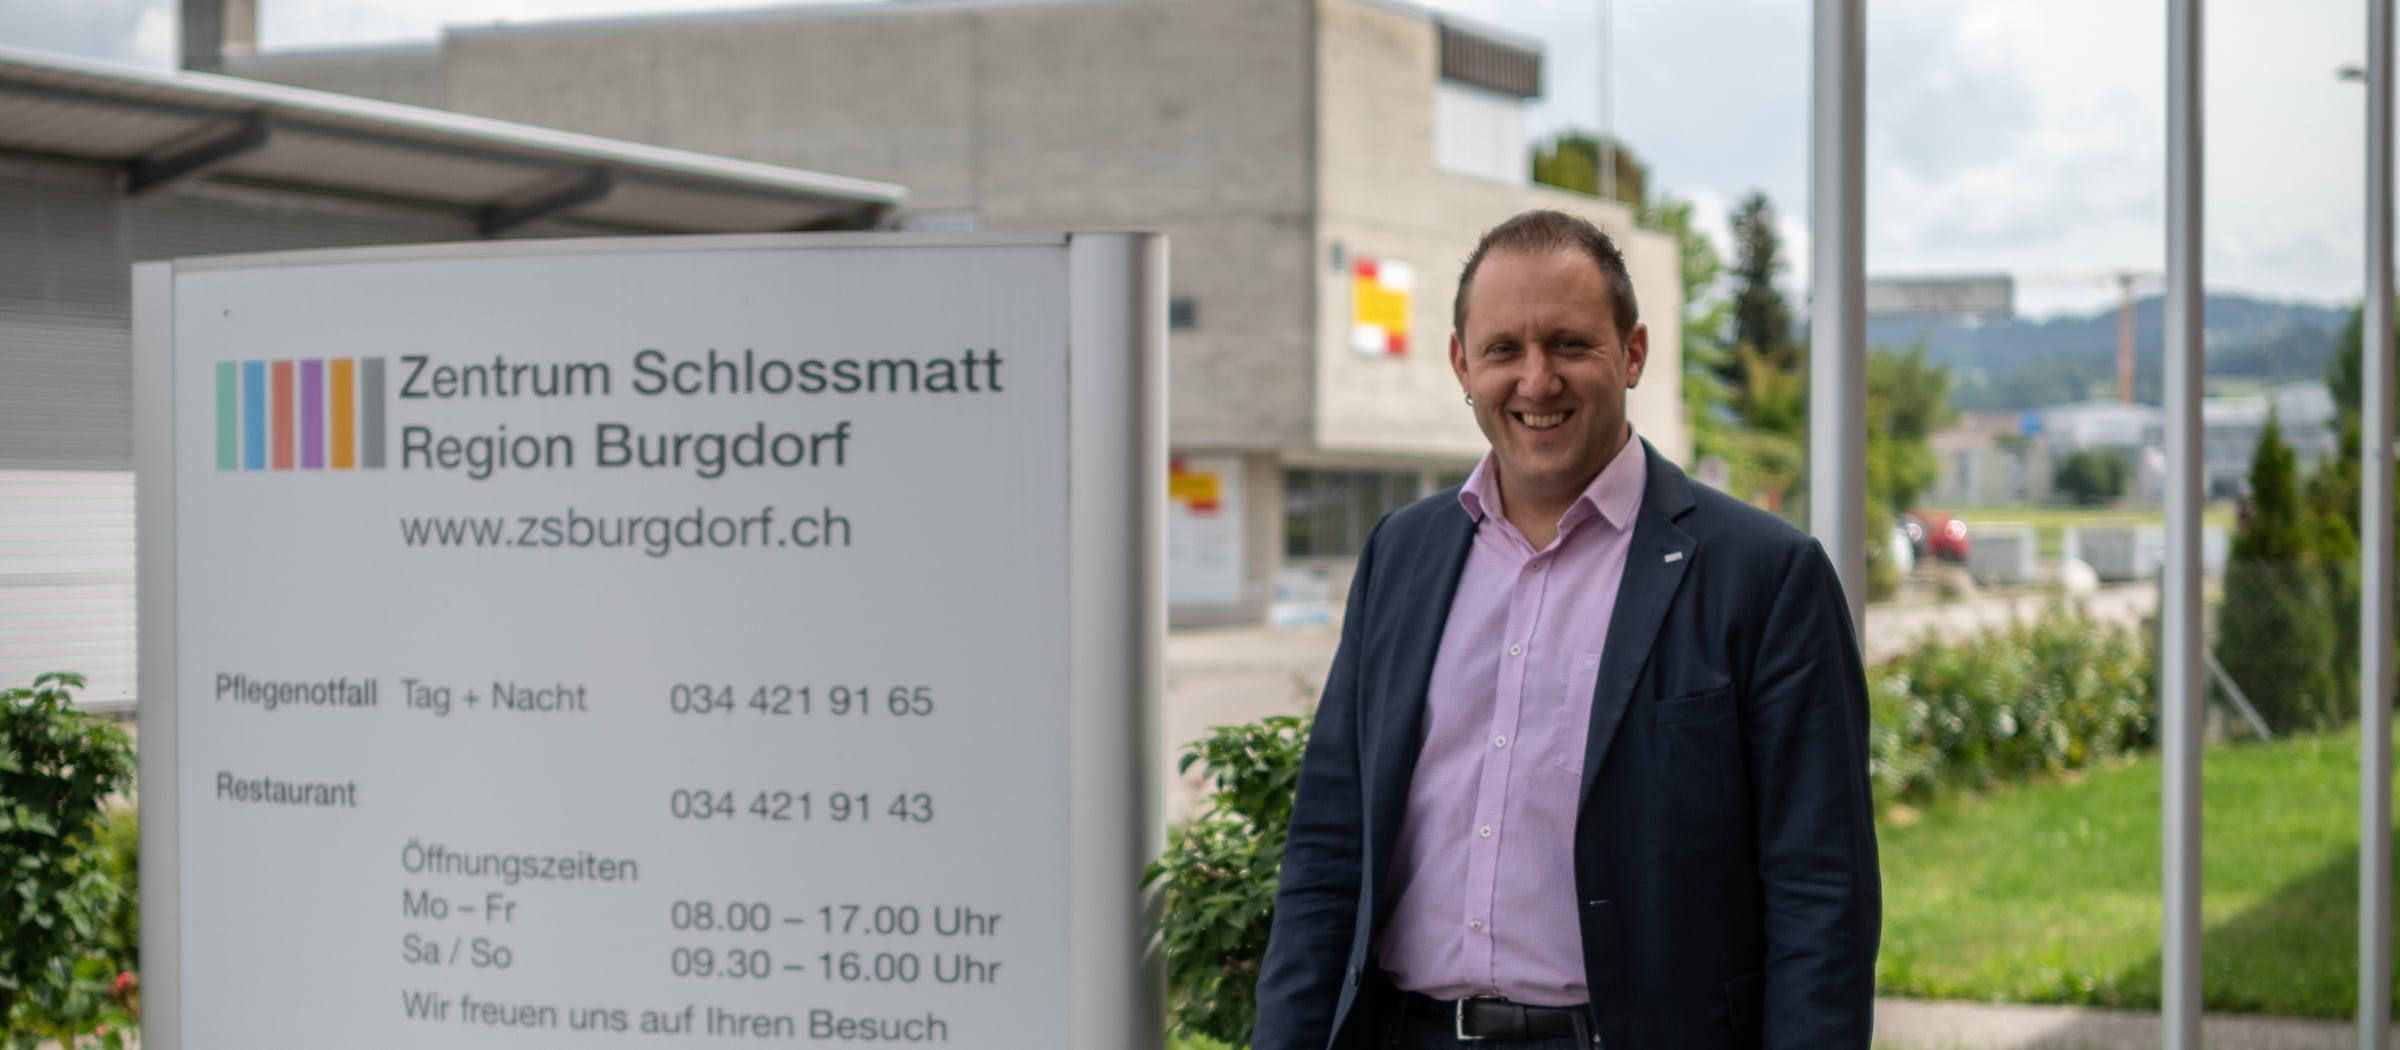 Inspiration Pistor Schlossmatt Reto Zuberbühler Pflegezentrum